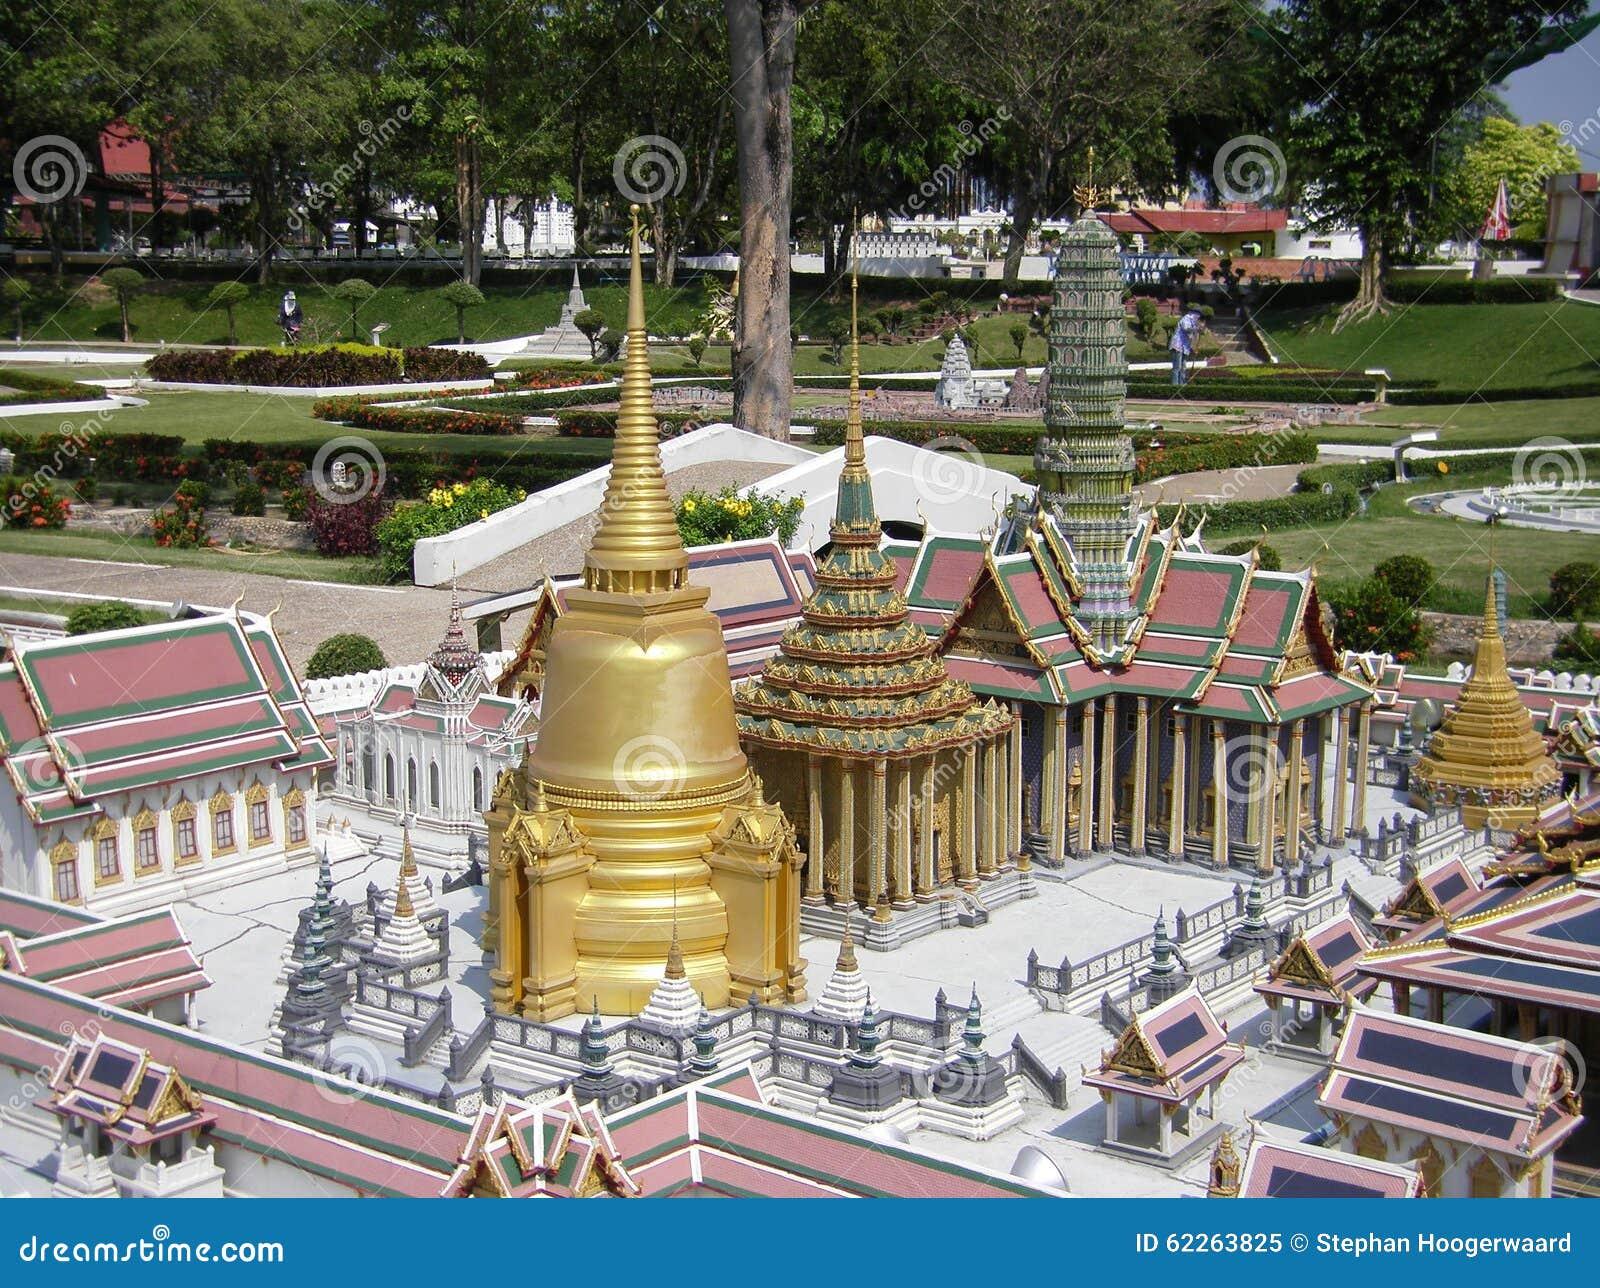 MINI SIAM, MINIATURE PARK, PATTAYA, THAILAND Stock Photo - Image: 62263825